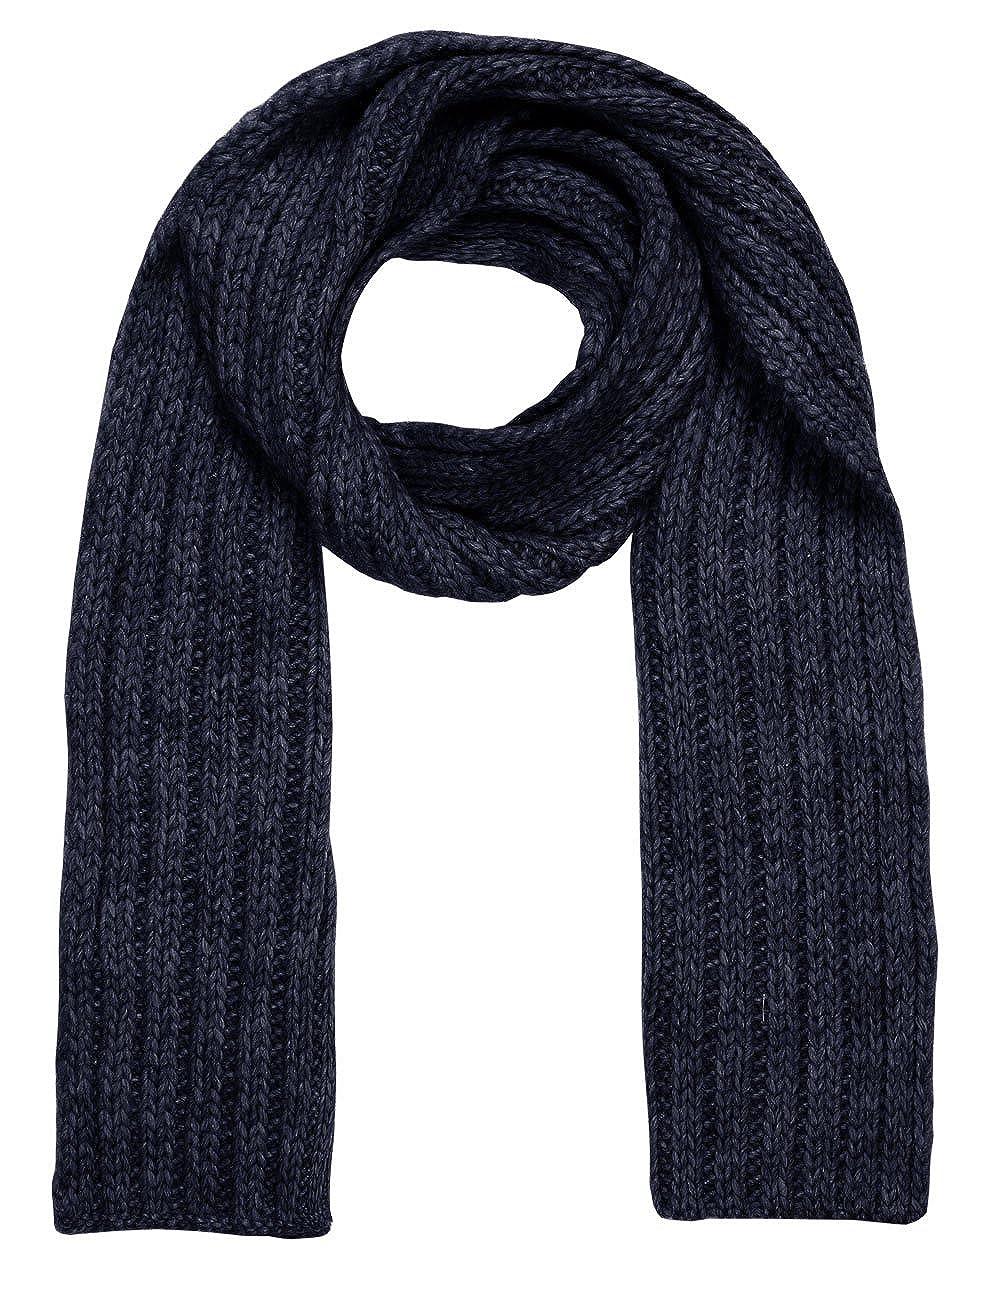 maximo Boy's Schal, Grobstrick, Einfarbig Scarf Blue (Navy 48) 23674-192300